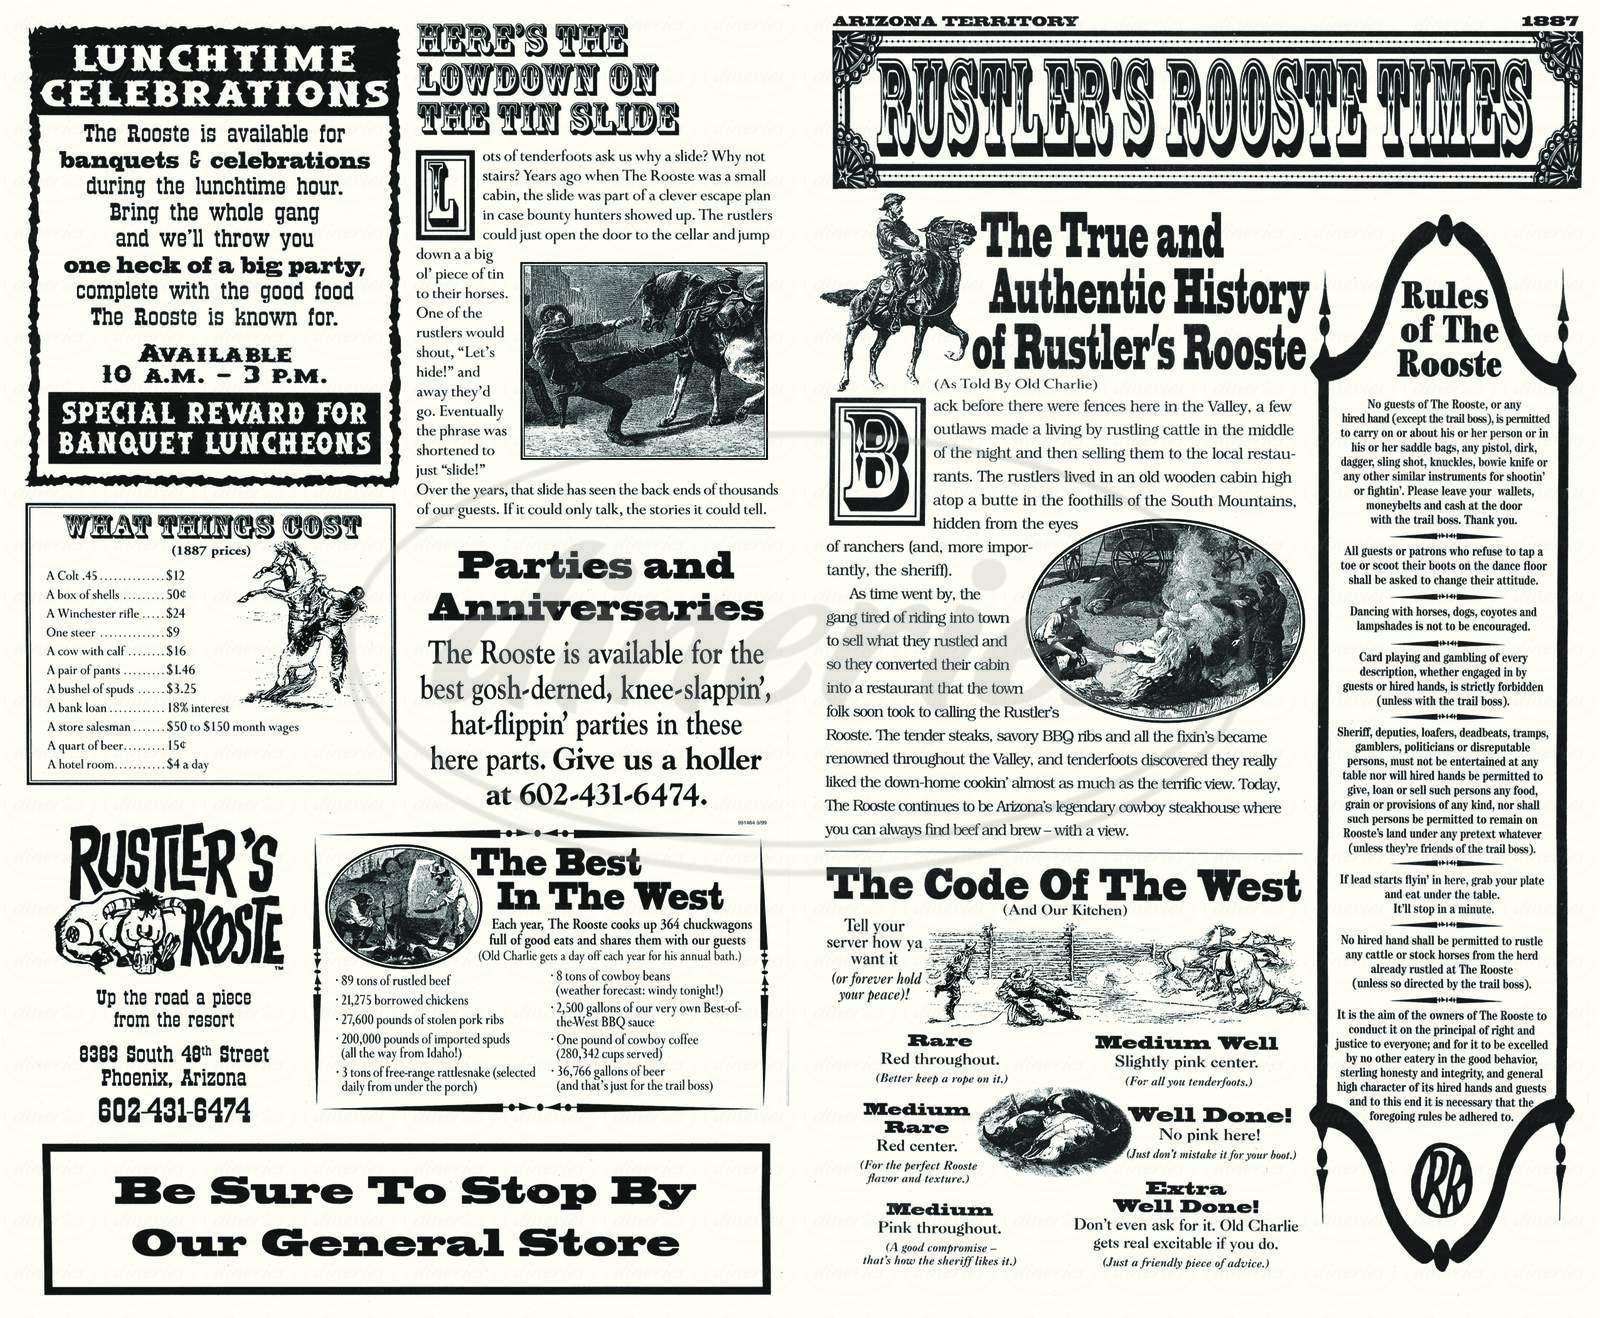 menu for Rustler's Rooste